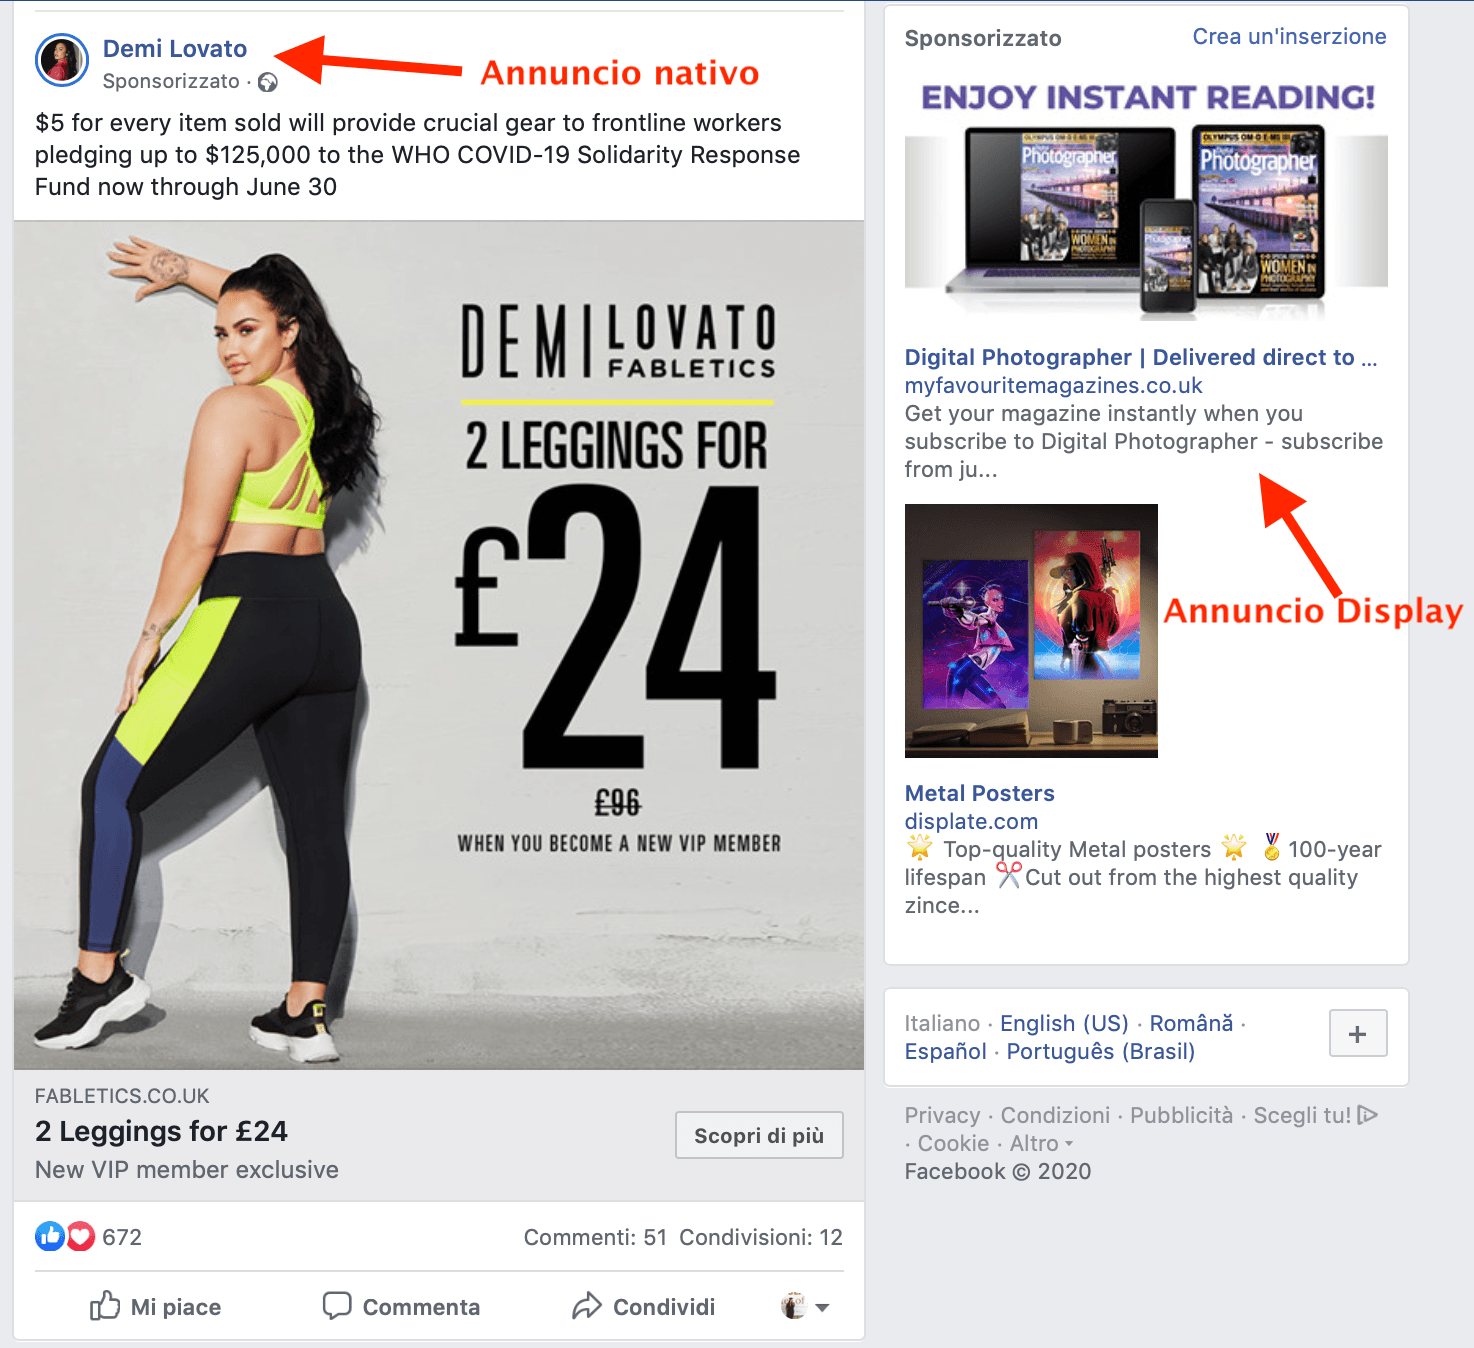 native advertising esempi facebook